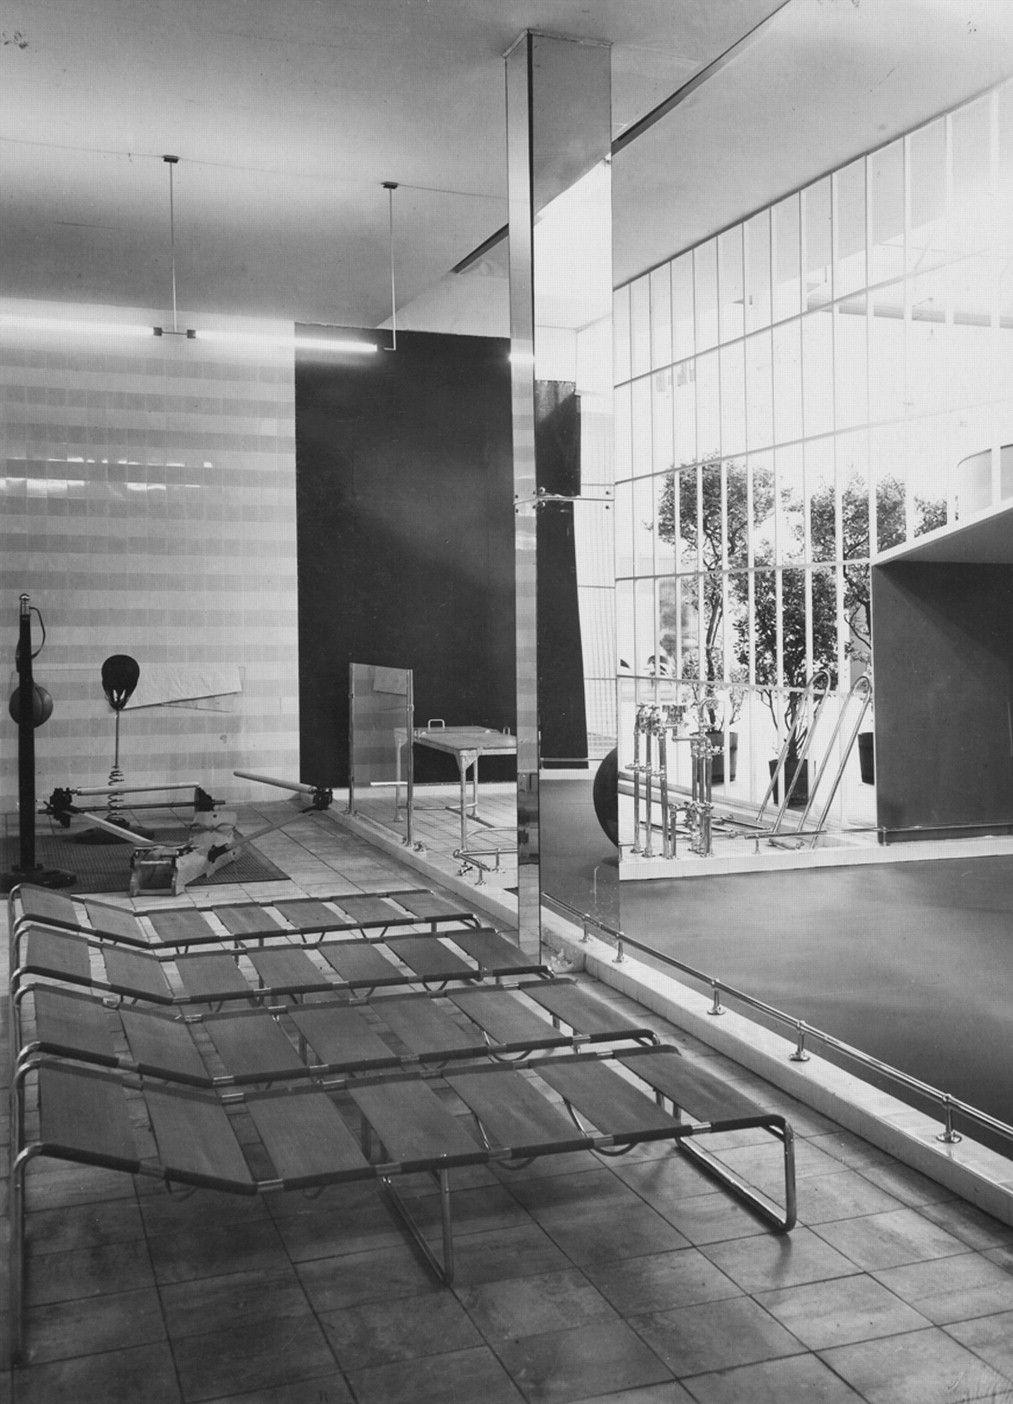 Walter Gropius Interior Walter gropius, Bauhaus